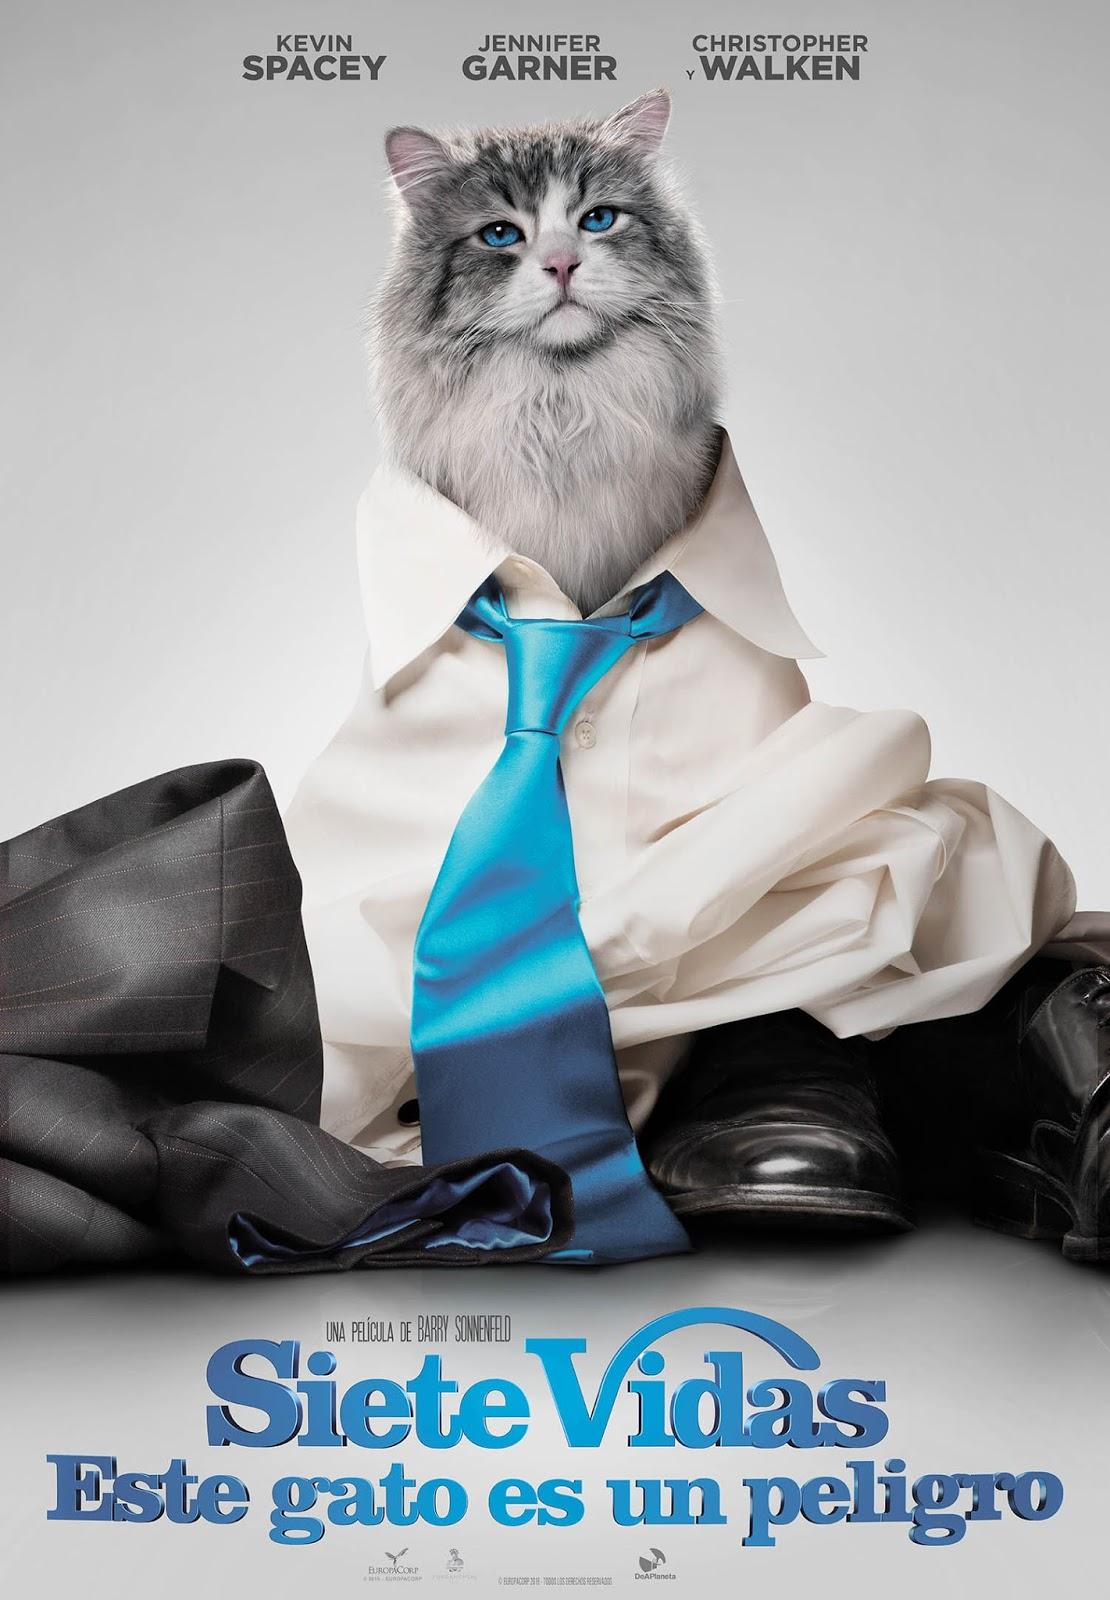 Póster final español de 'Siete vidas, este gato es un peligro'